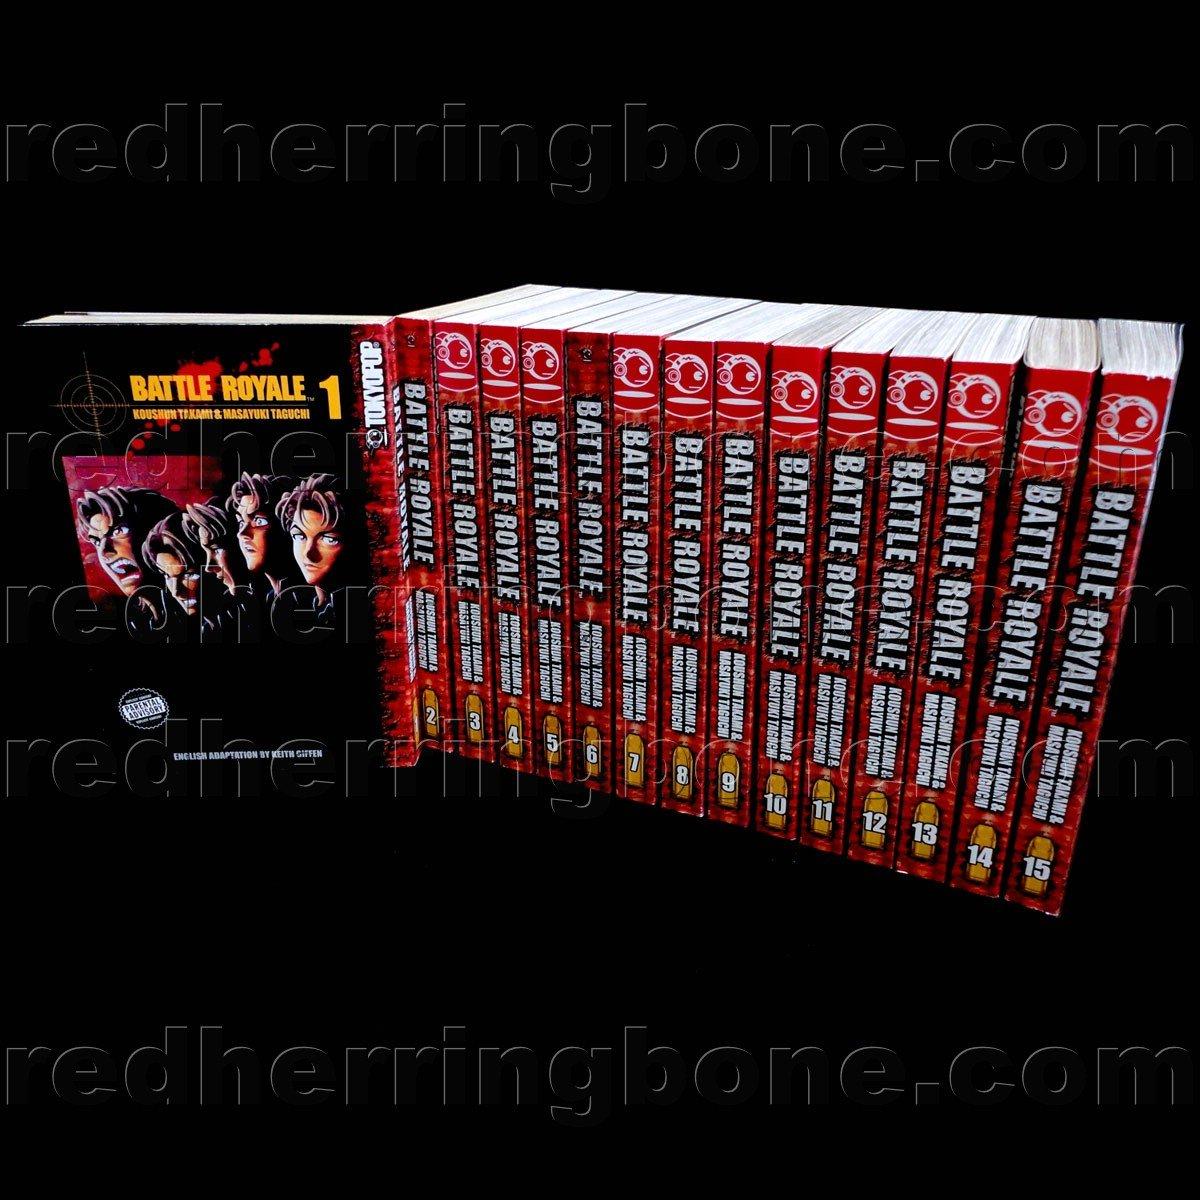 Battle Royale, Vol  1-15 Manga (set includes 15 volumes